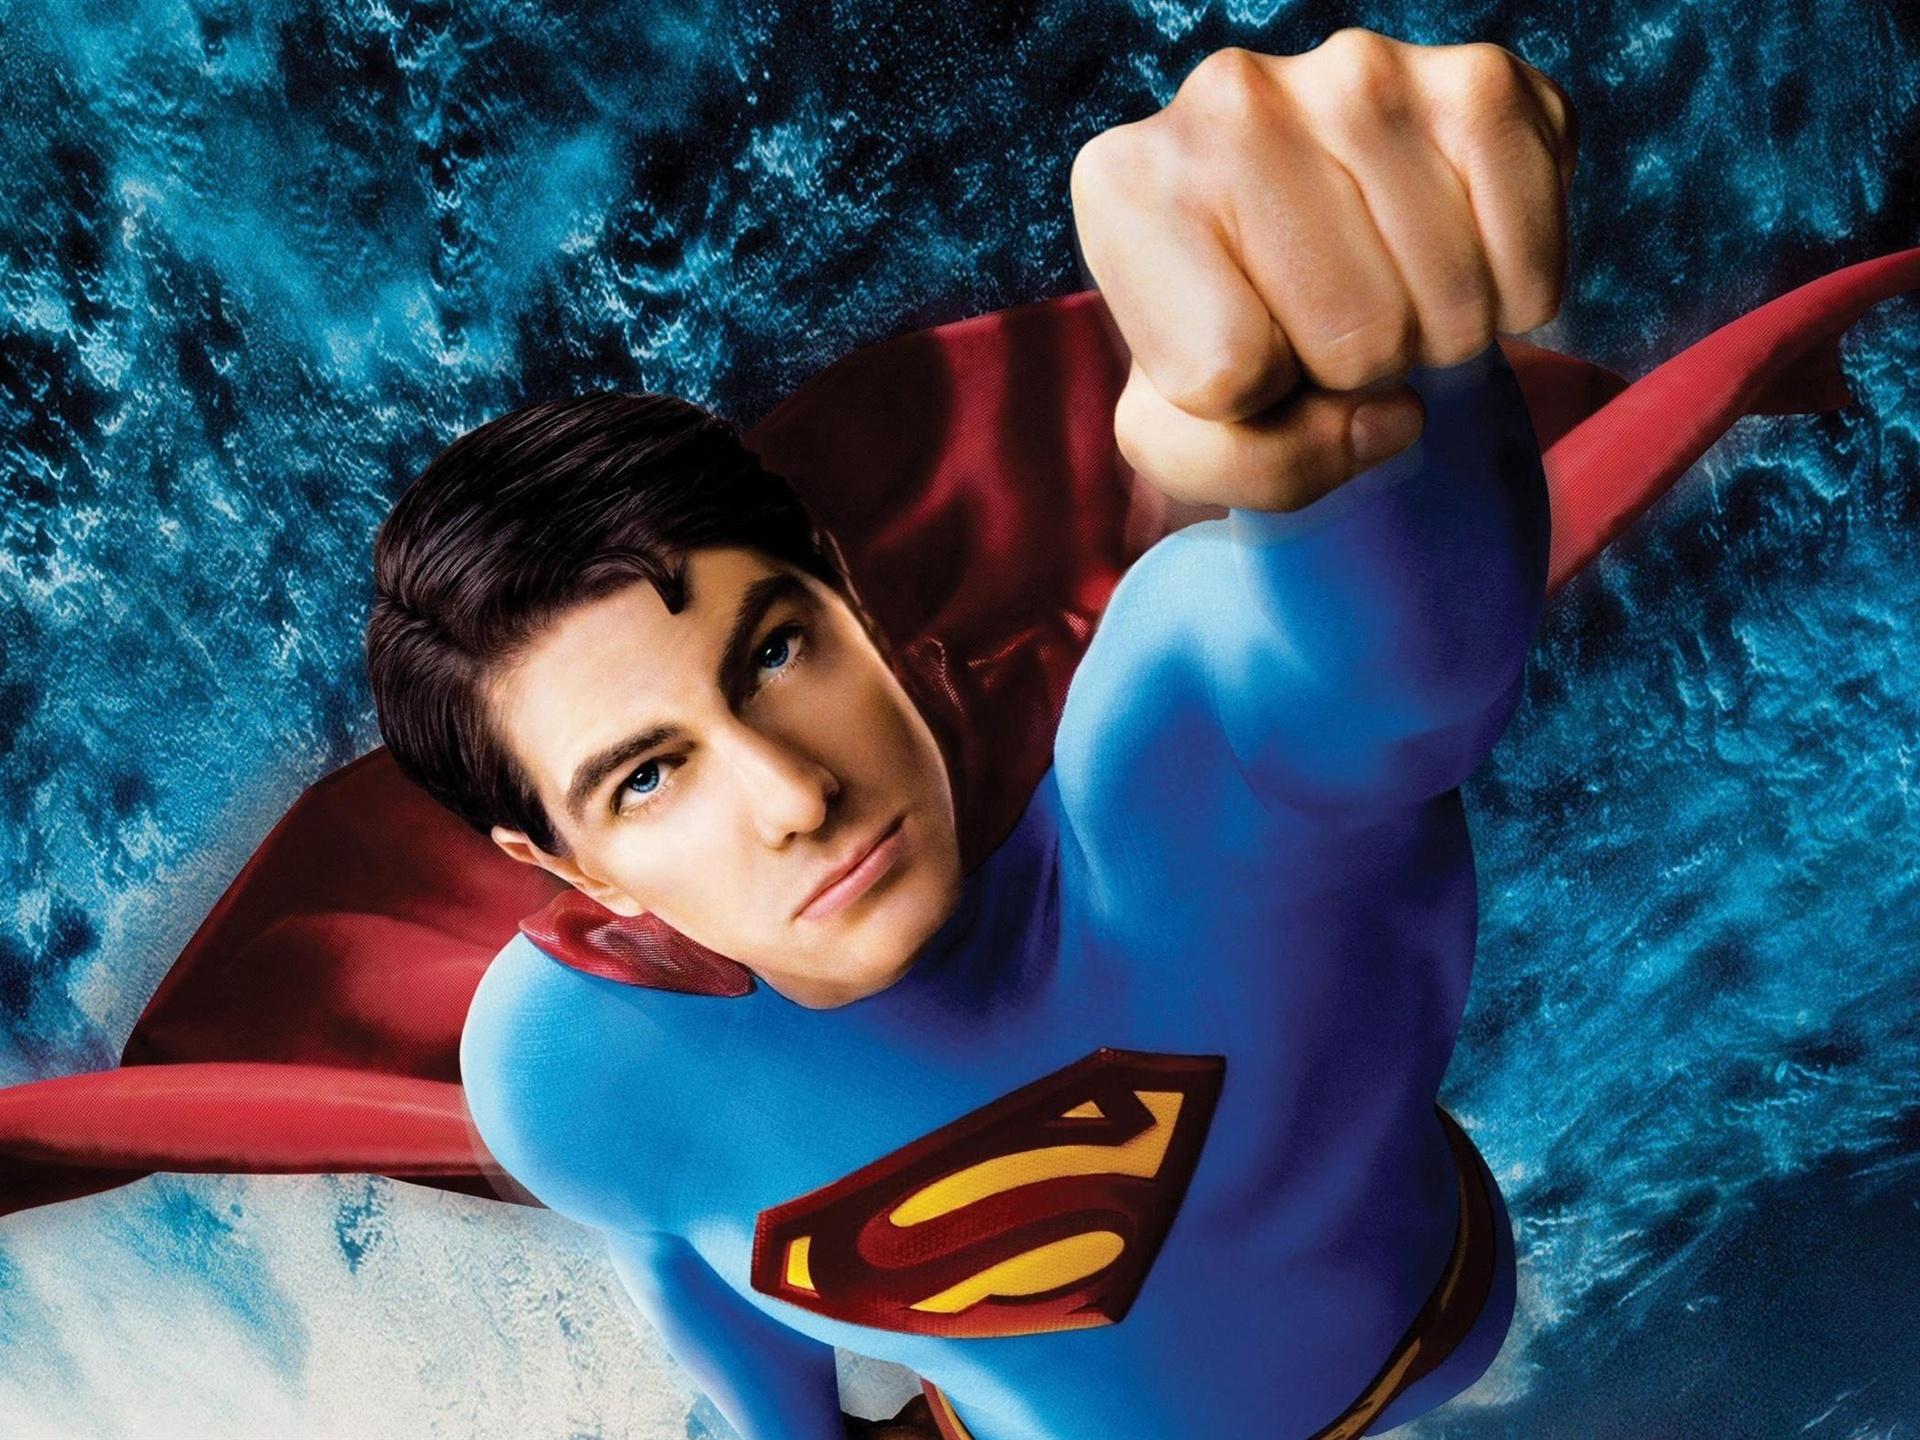 Картинка с суперменами